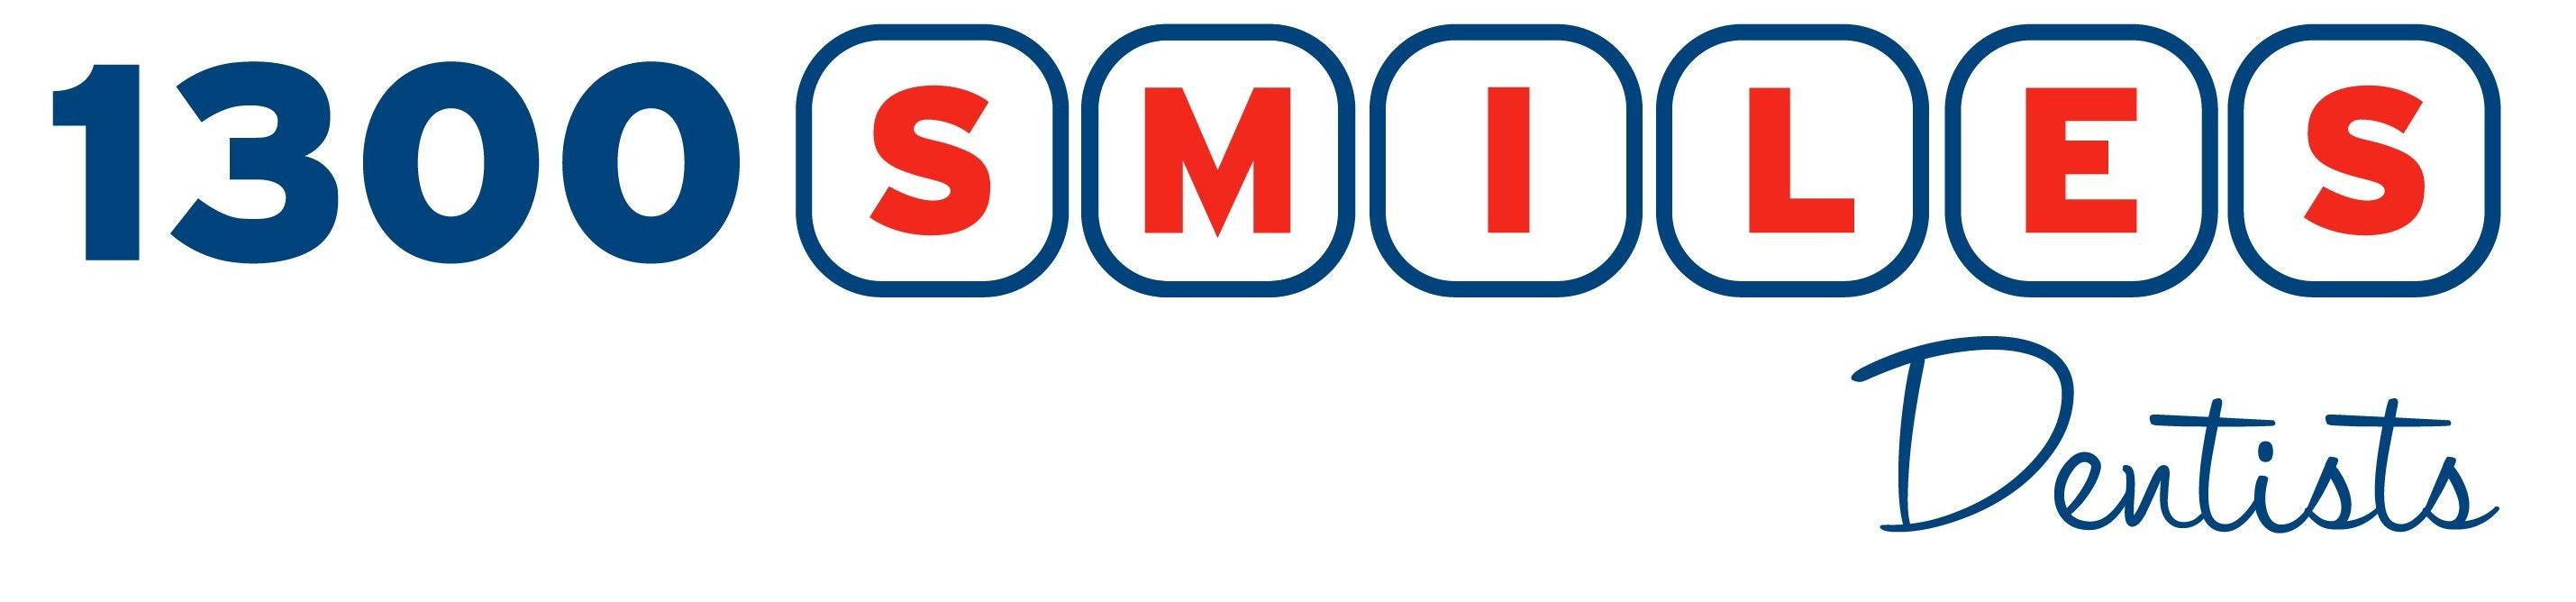 1300 Smiles - Rockhampton